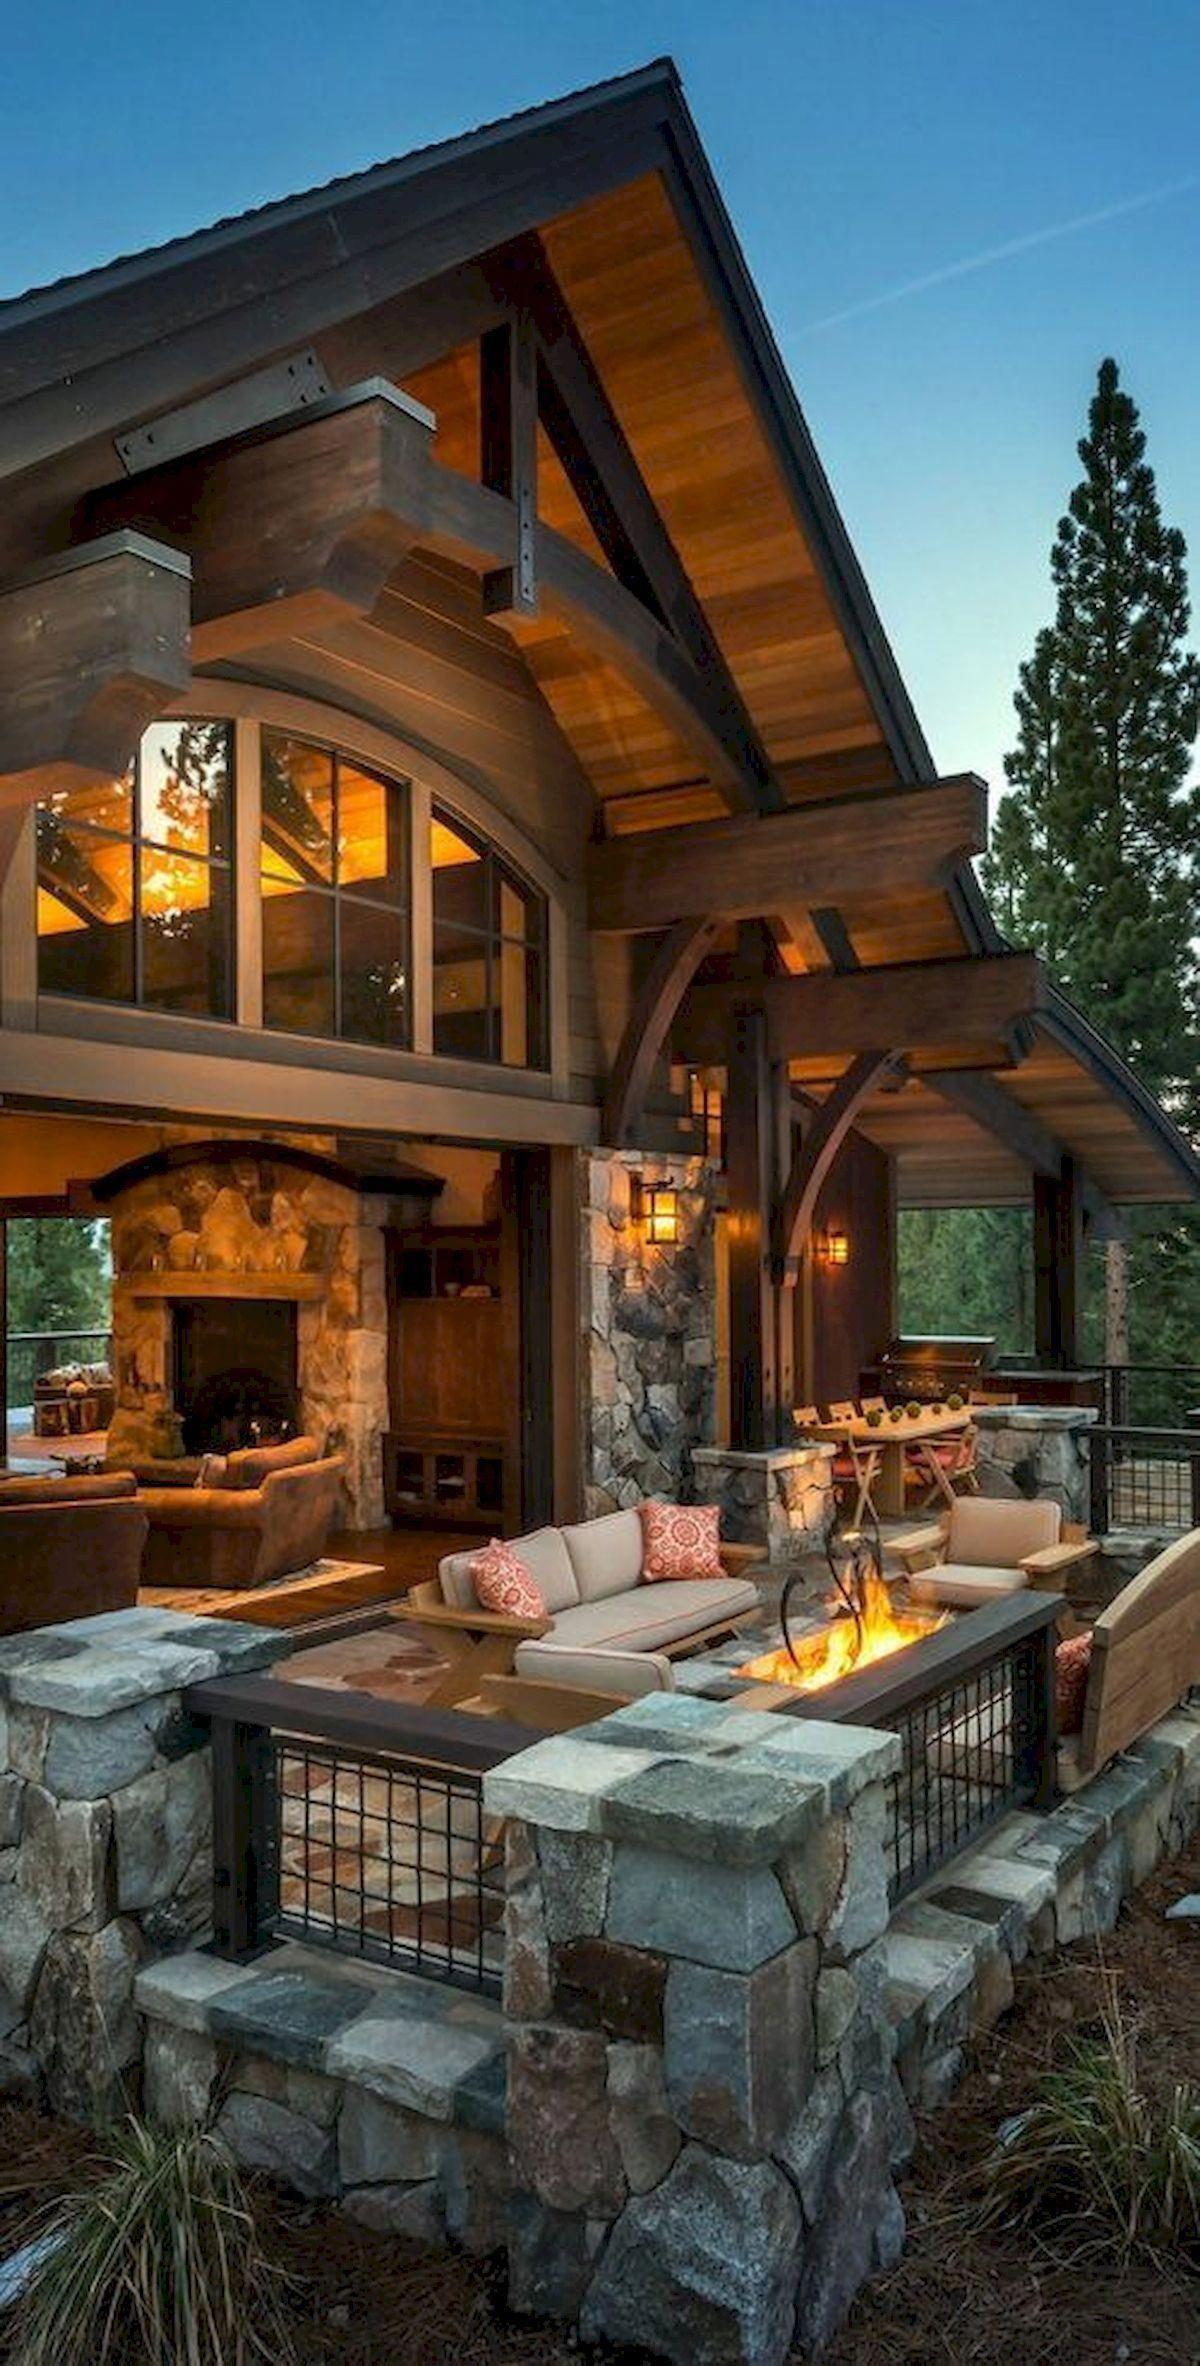 50 Incredible Log Cabin Homes Modern Design Ideas 8 Cabindecorating Rustic Log House Plans Log Home Interiors Log Home Plans